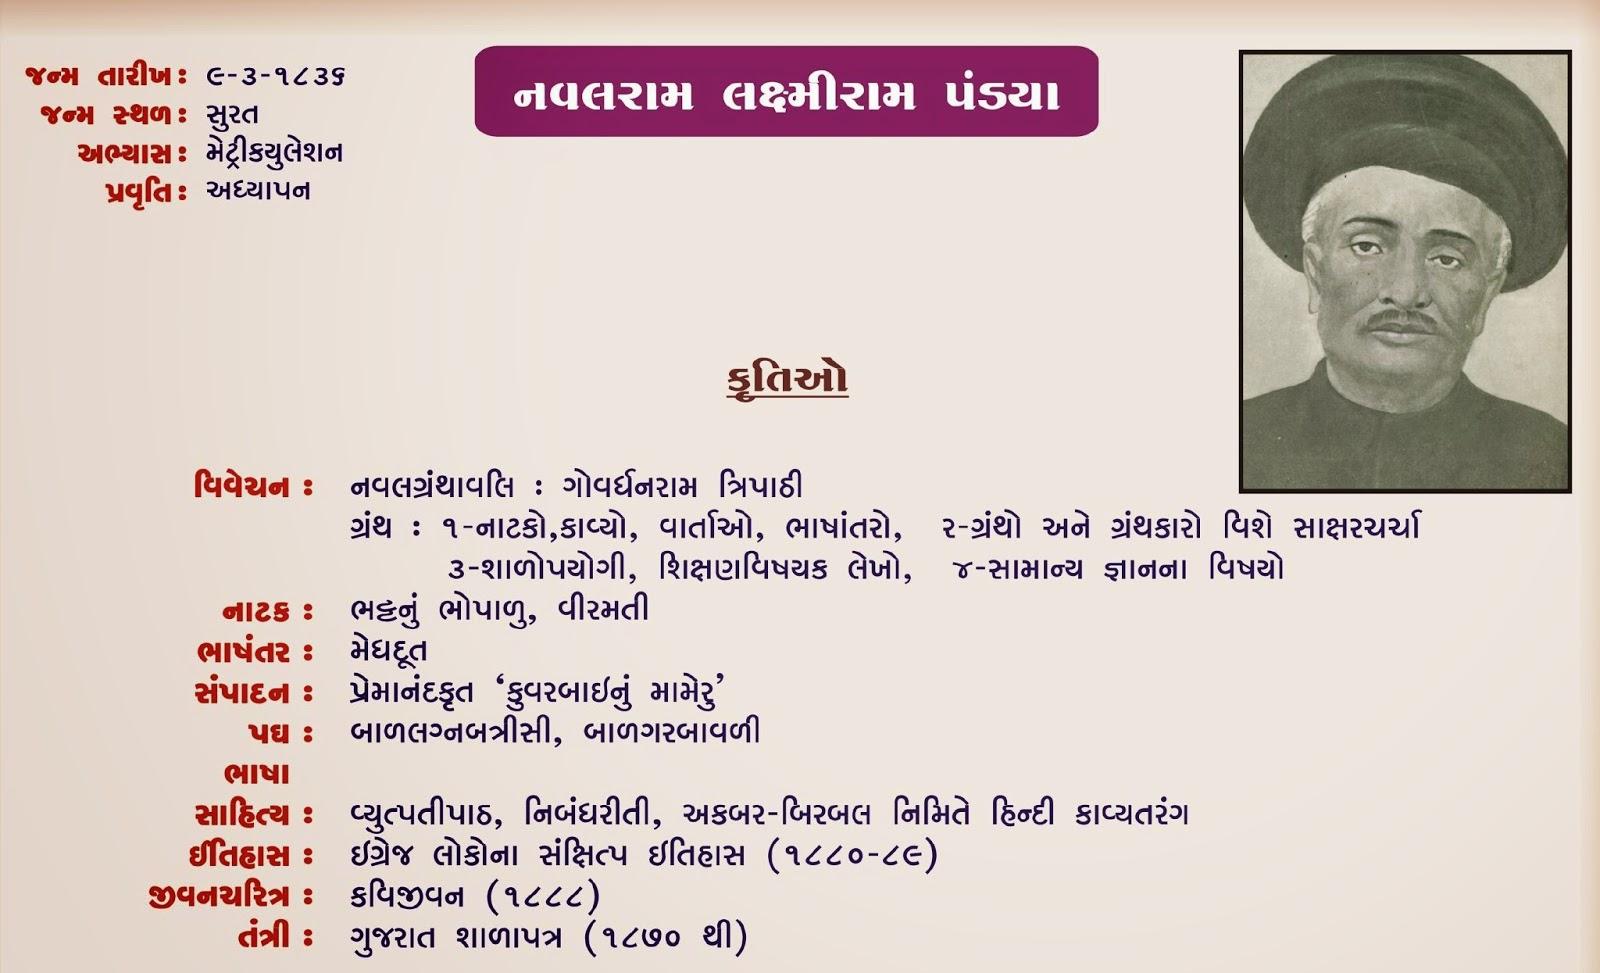 gujarati calendar 2015 with festivals pdf